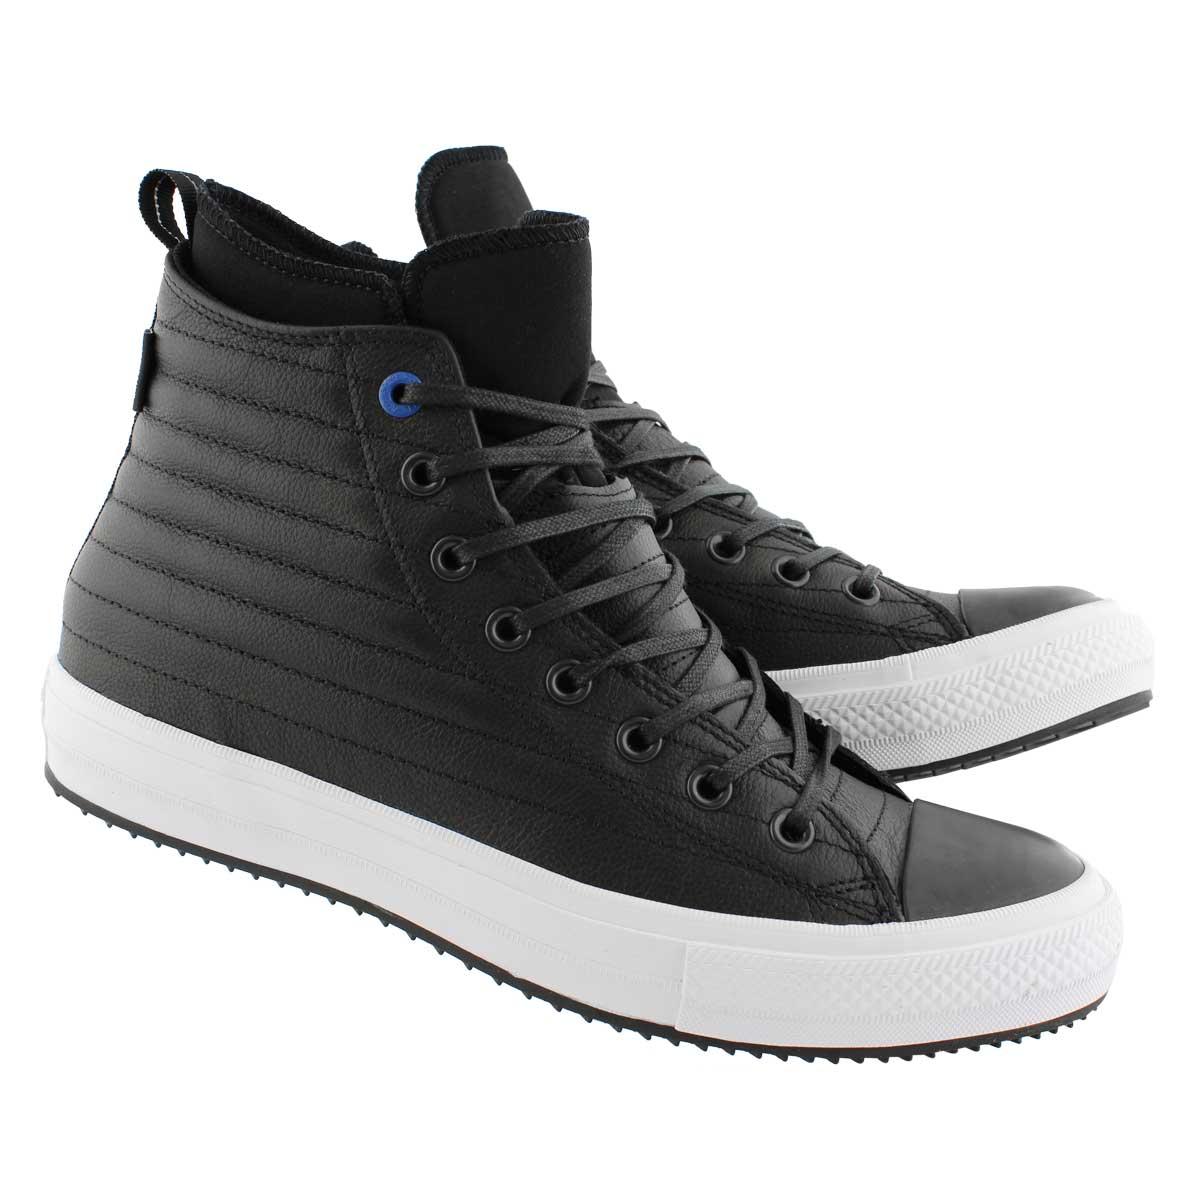 Mns CT Waterproof Hi blk/blue boot